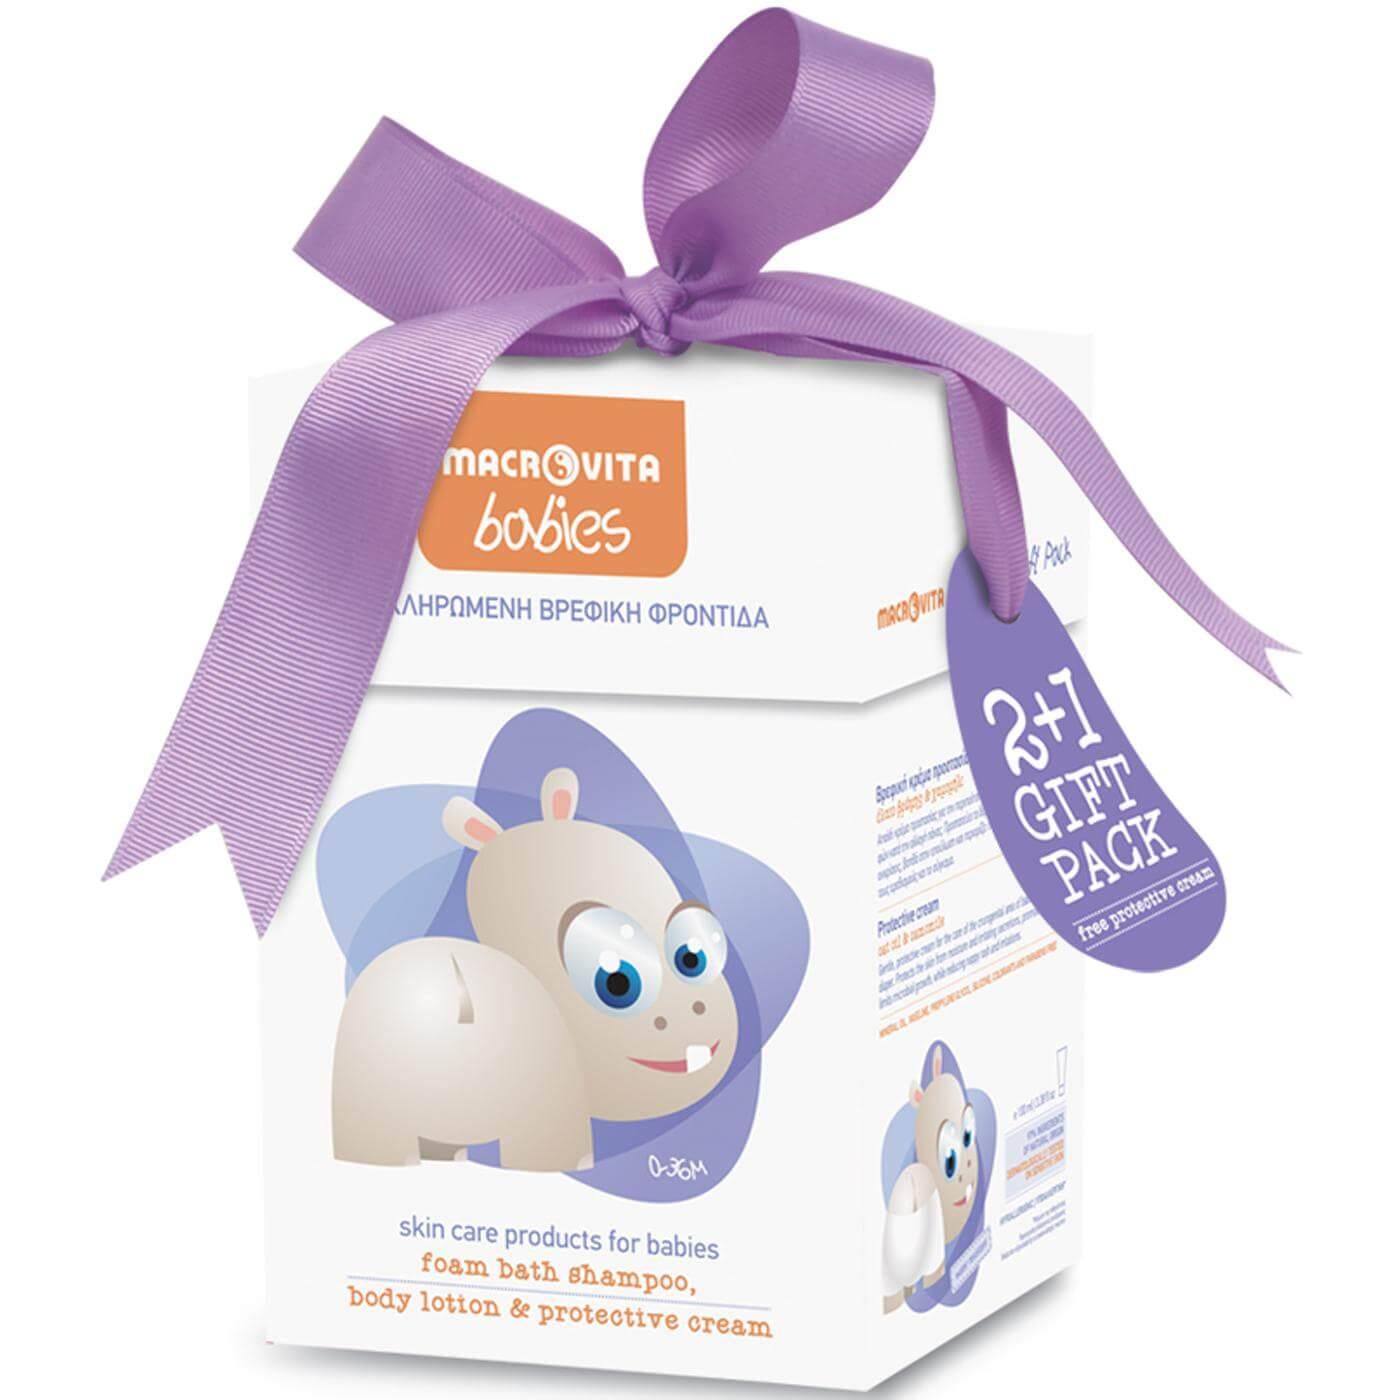 Macrovita Babies Πολυσυσκευασία Δώρου Βρεφικής Περιποίησης με Foam Bath Shampoo 300ml, Body Lotion 150ml, Protective Cream 100ml